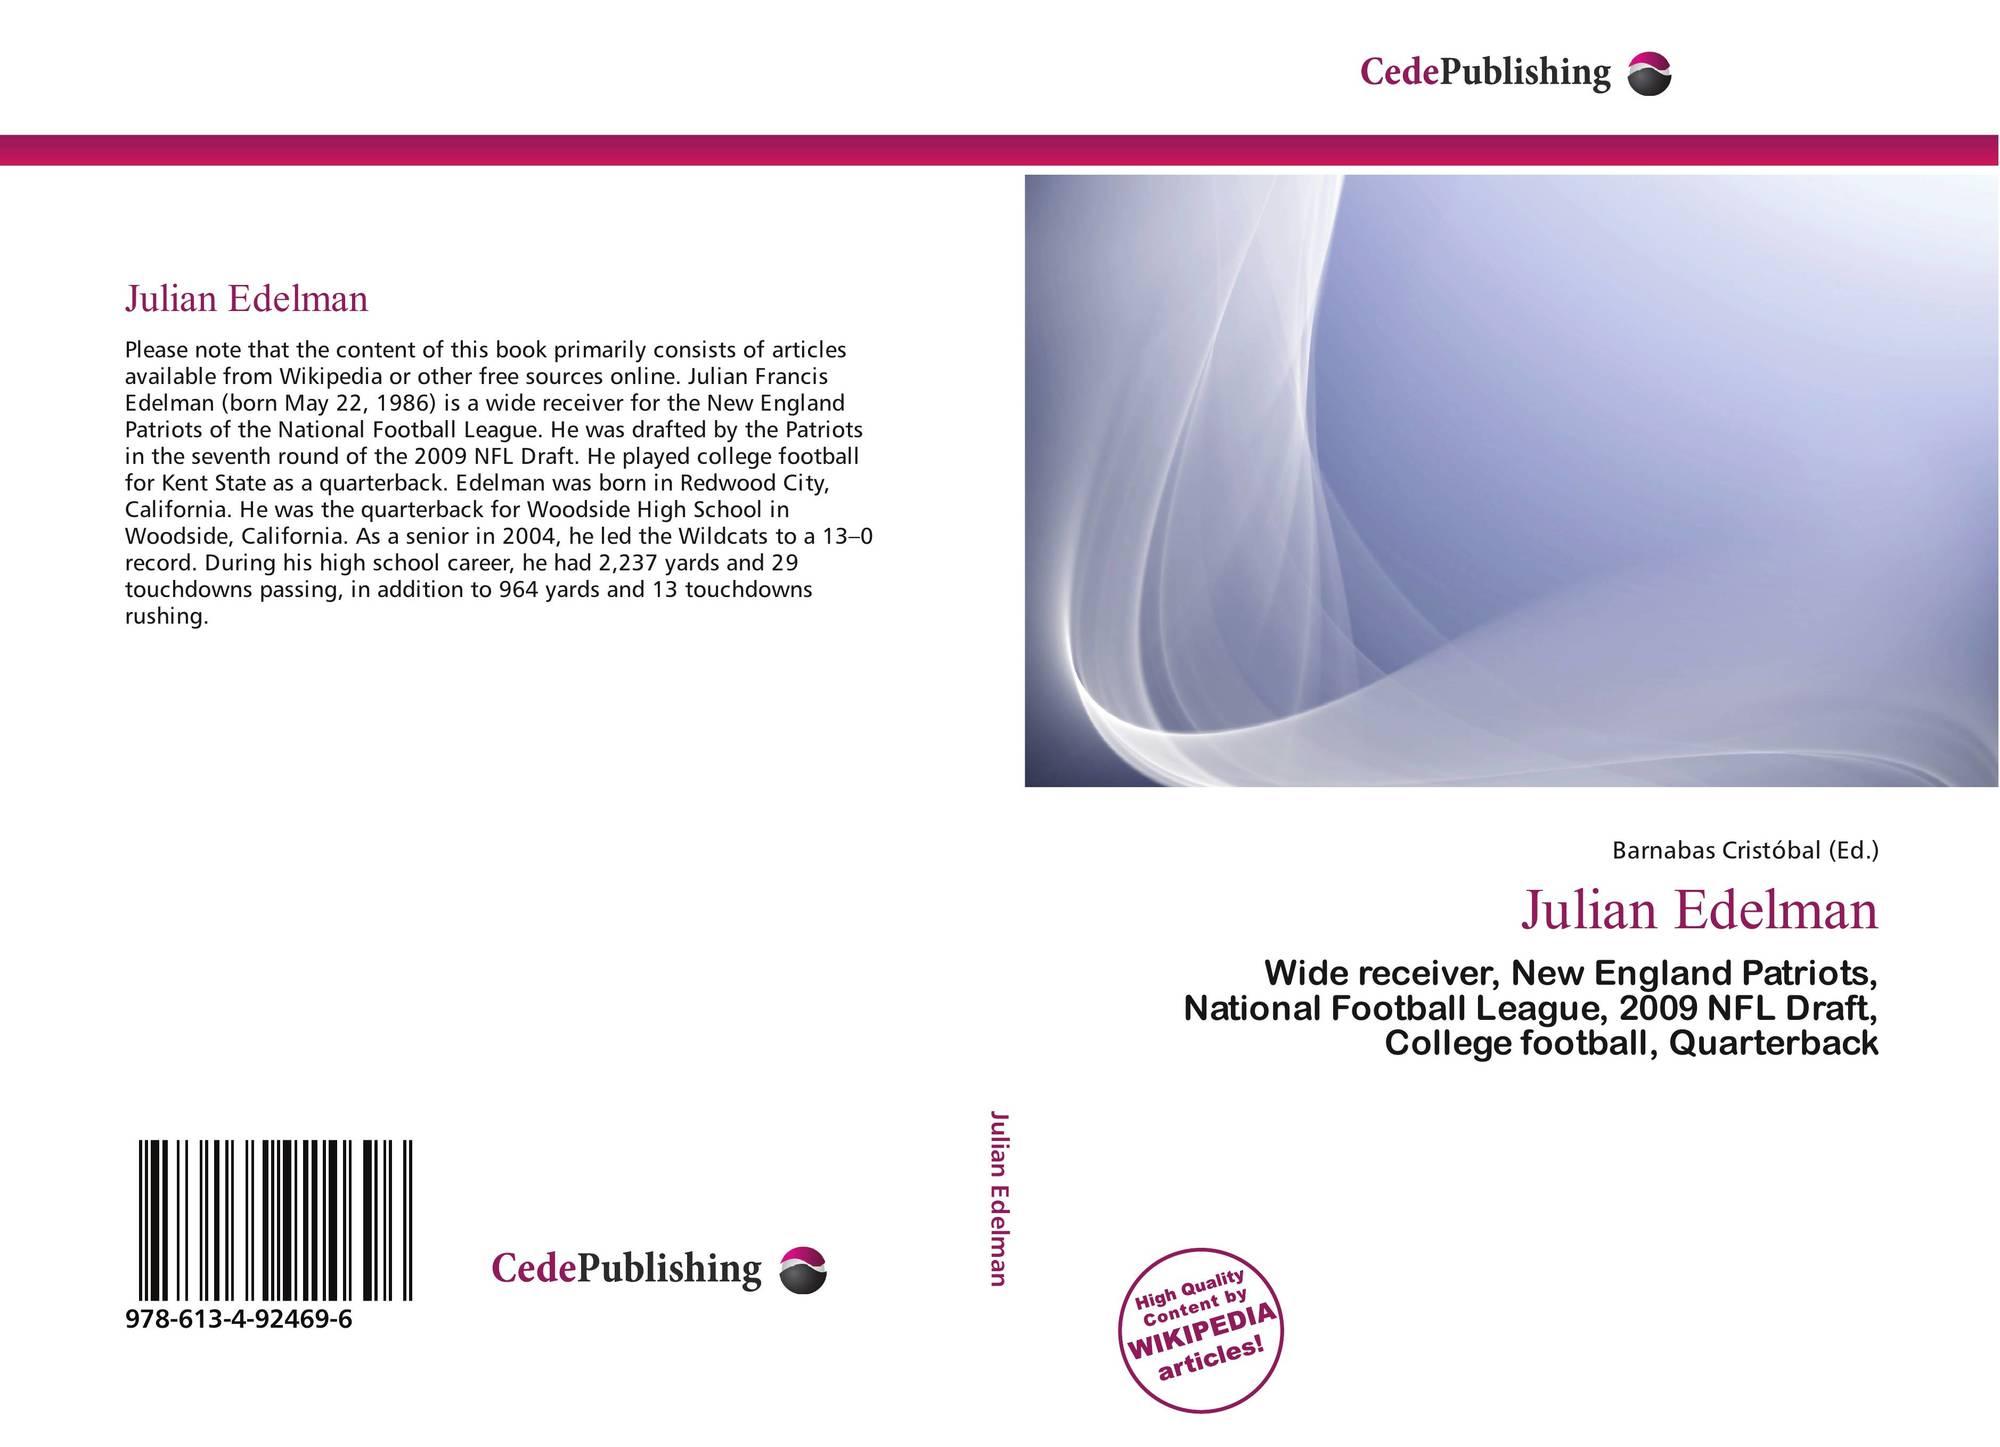 Julian Edelman 978 613 4 92469 6 6134924695 9786134924696